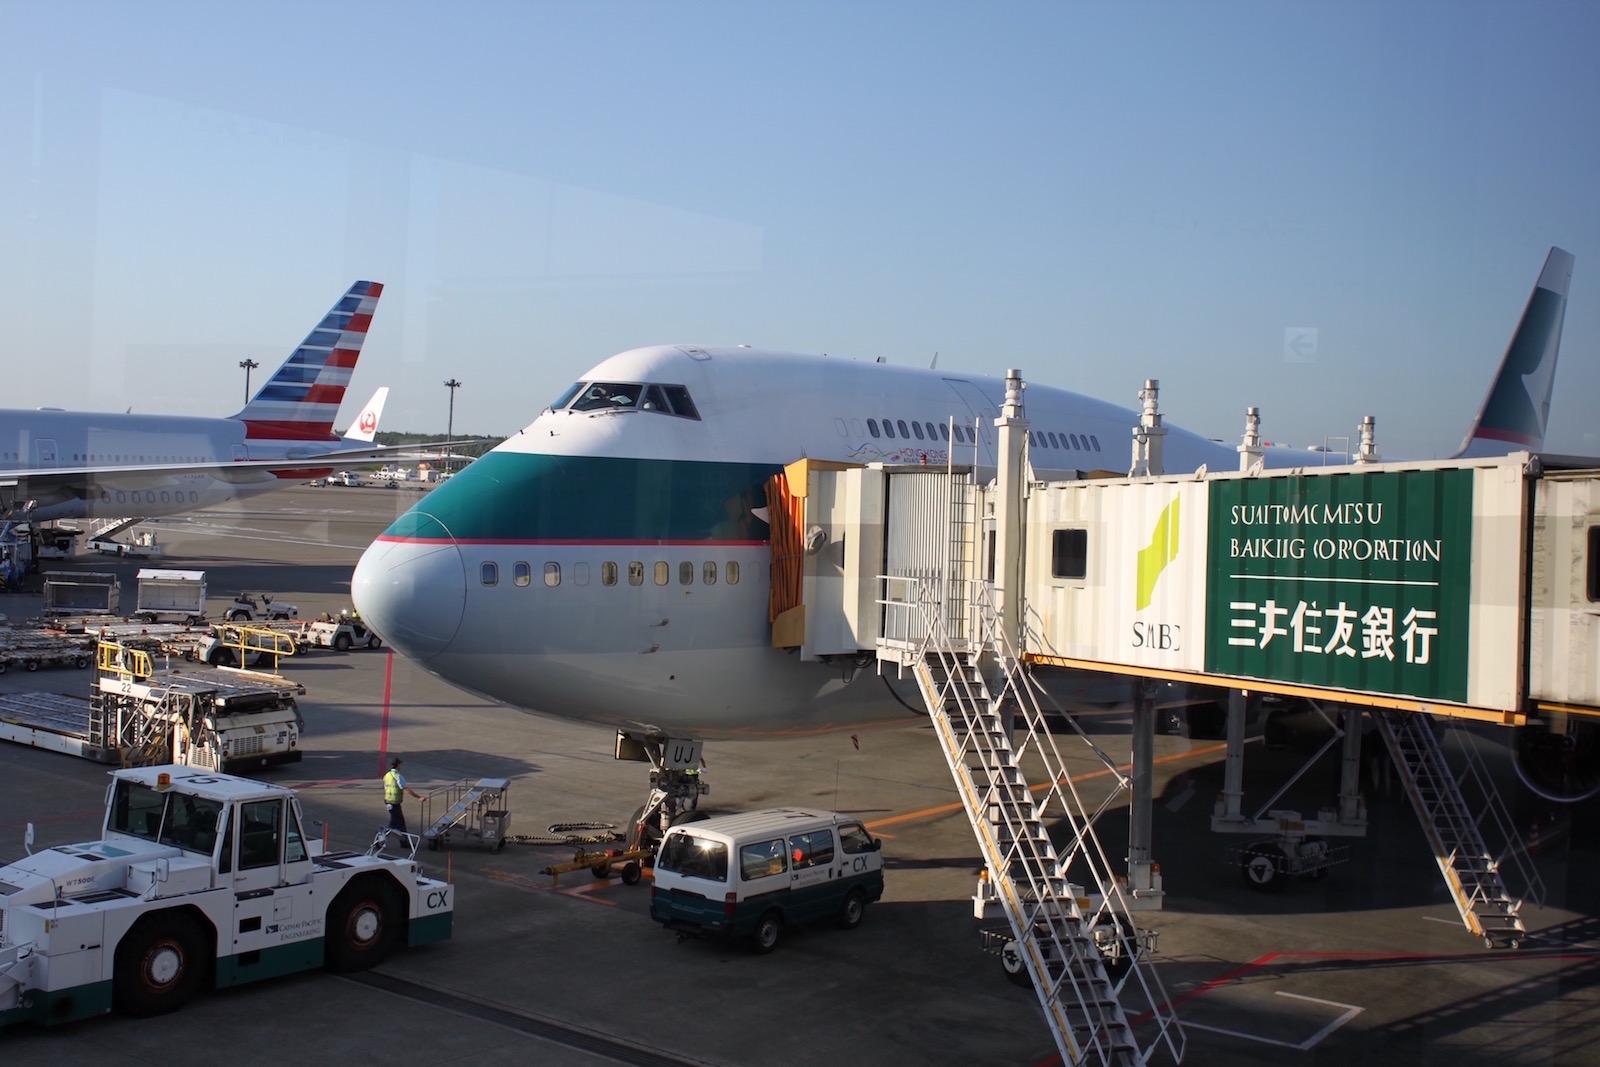 Sonnencreme Flugzeug